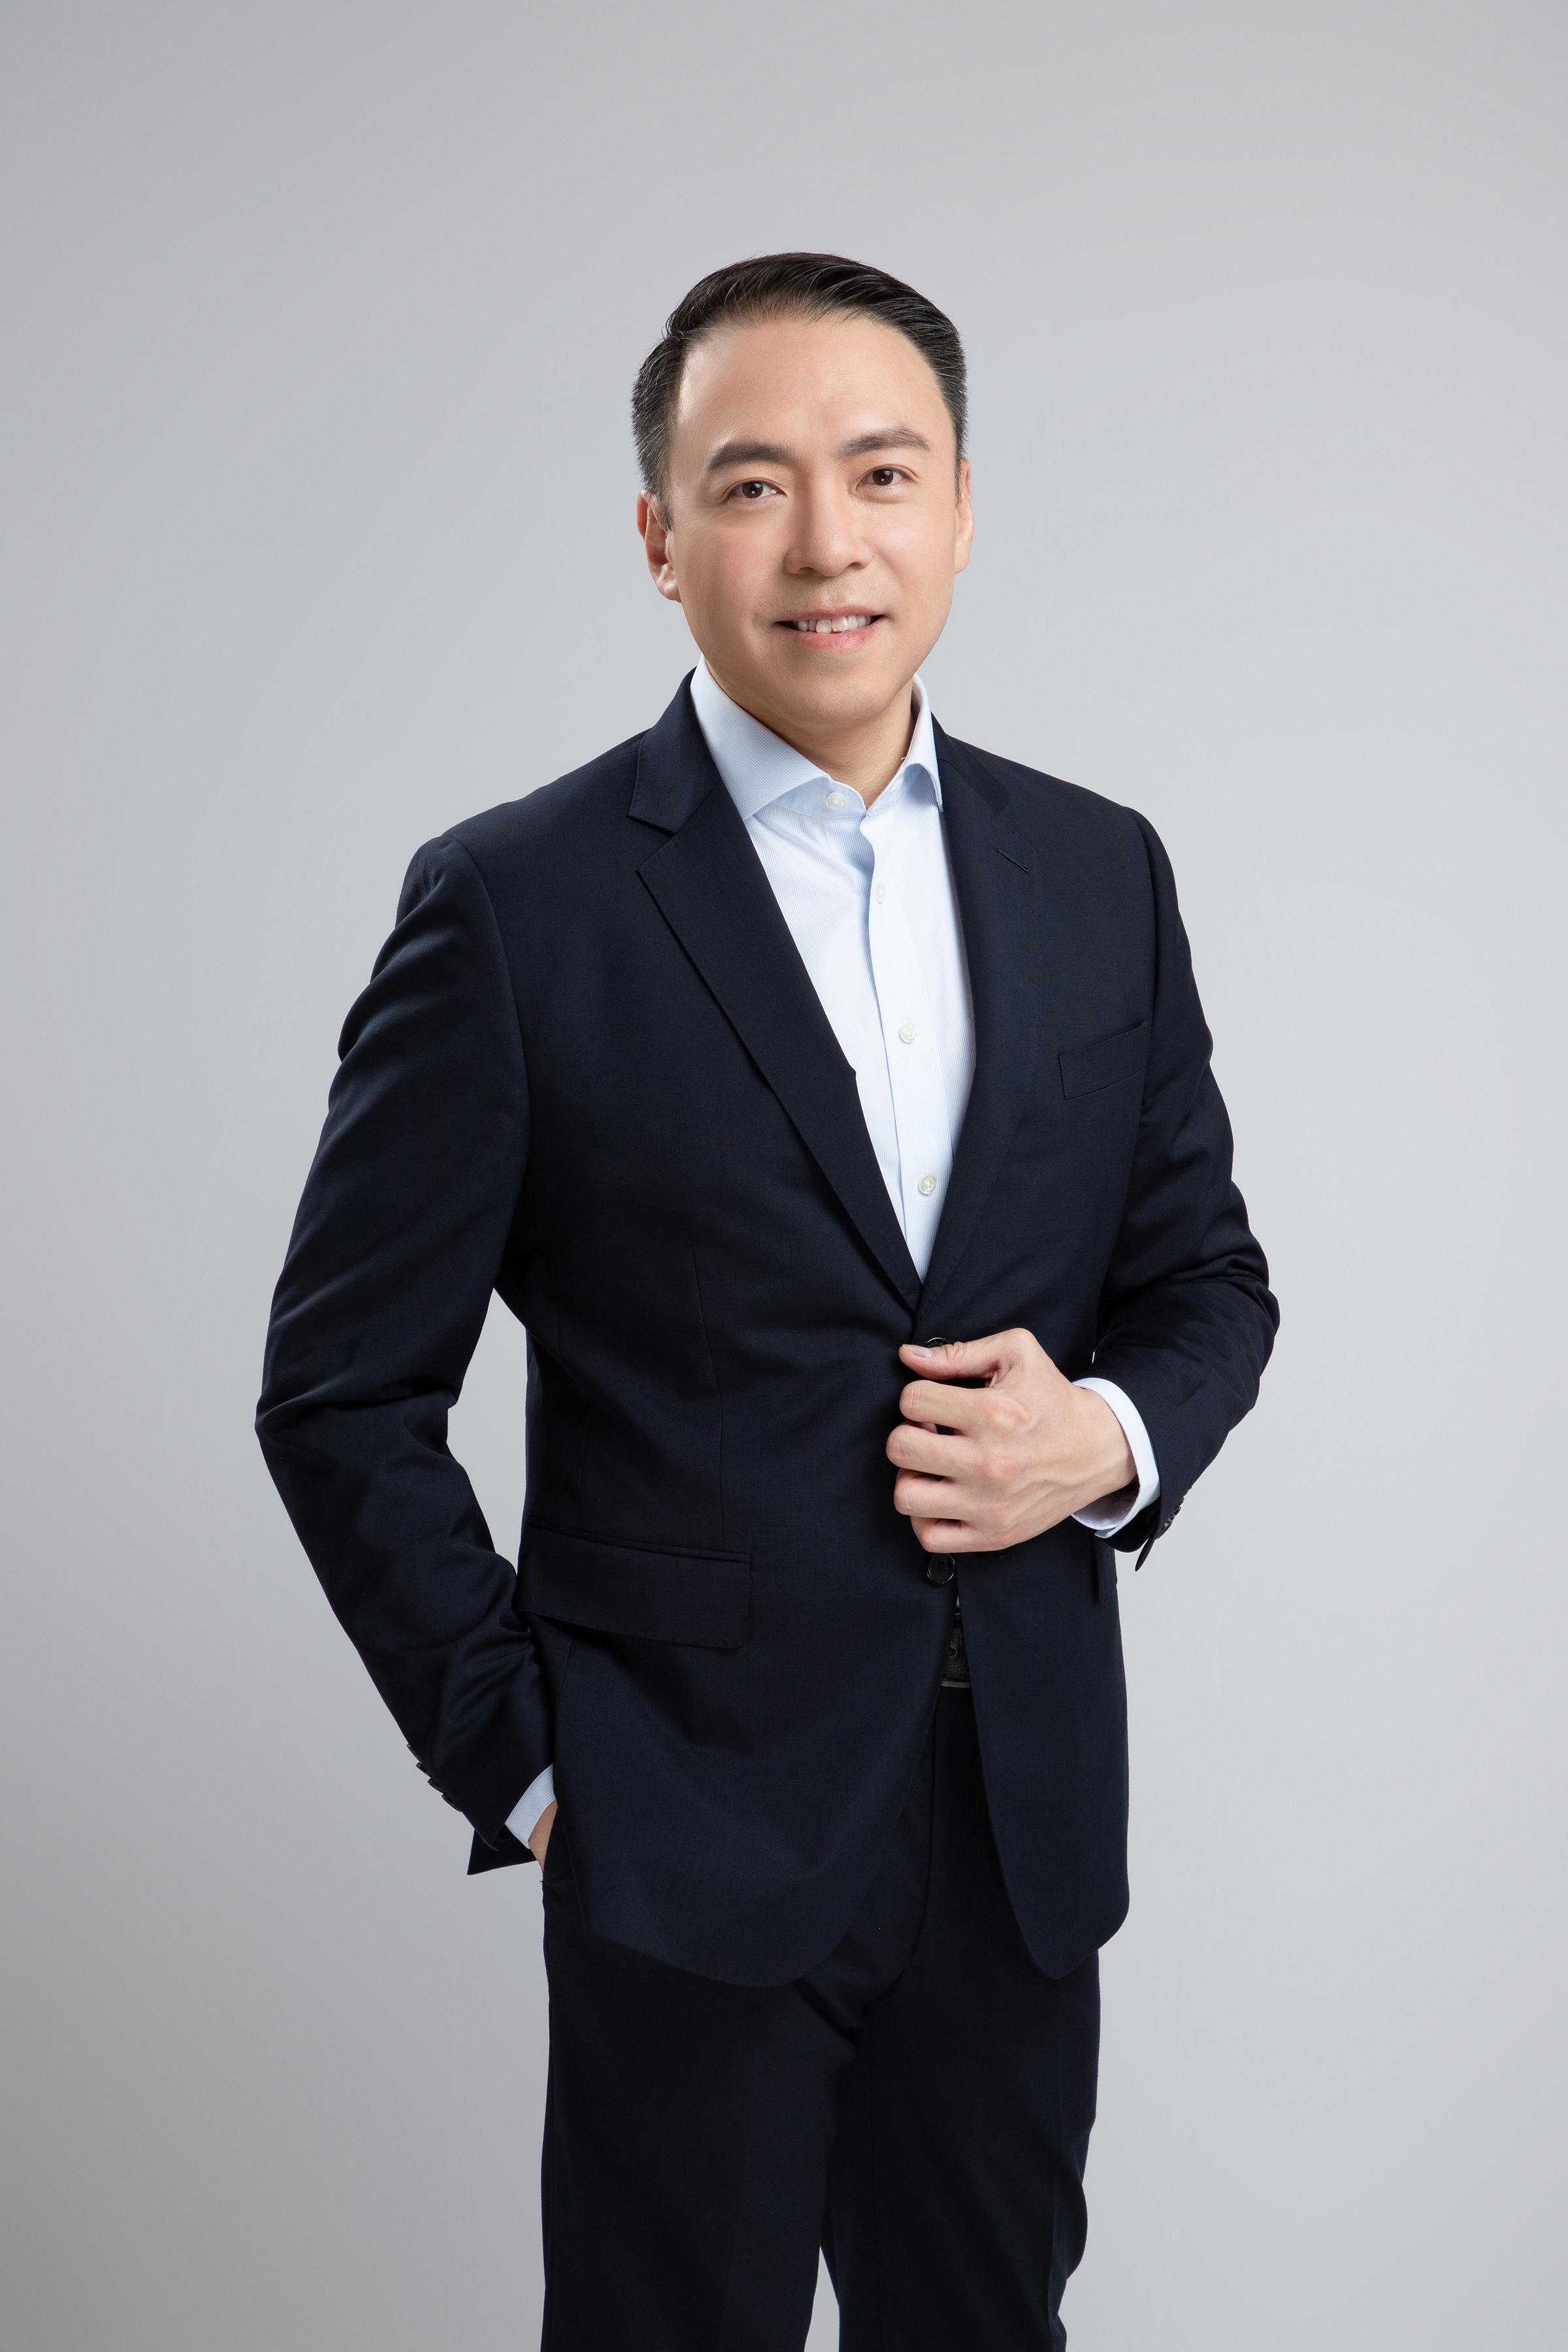 Imagination任命白农(Wallace Pai)担任Imagination中国区董事长